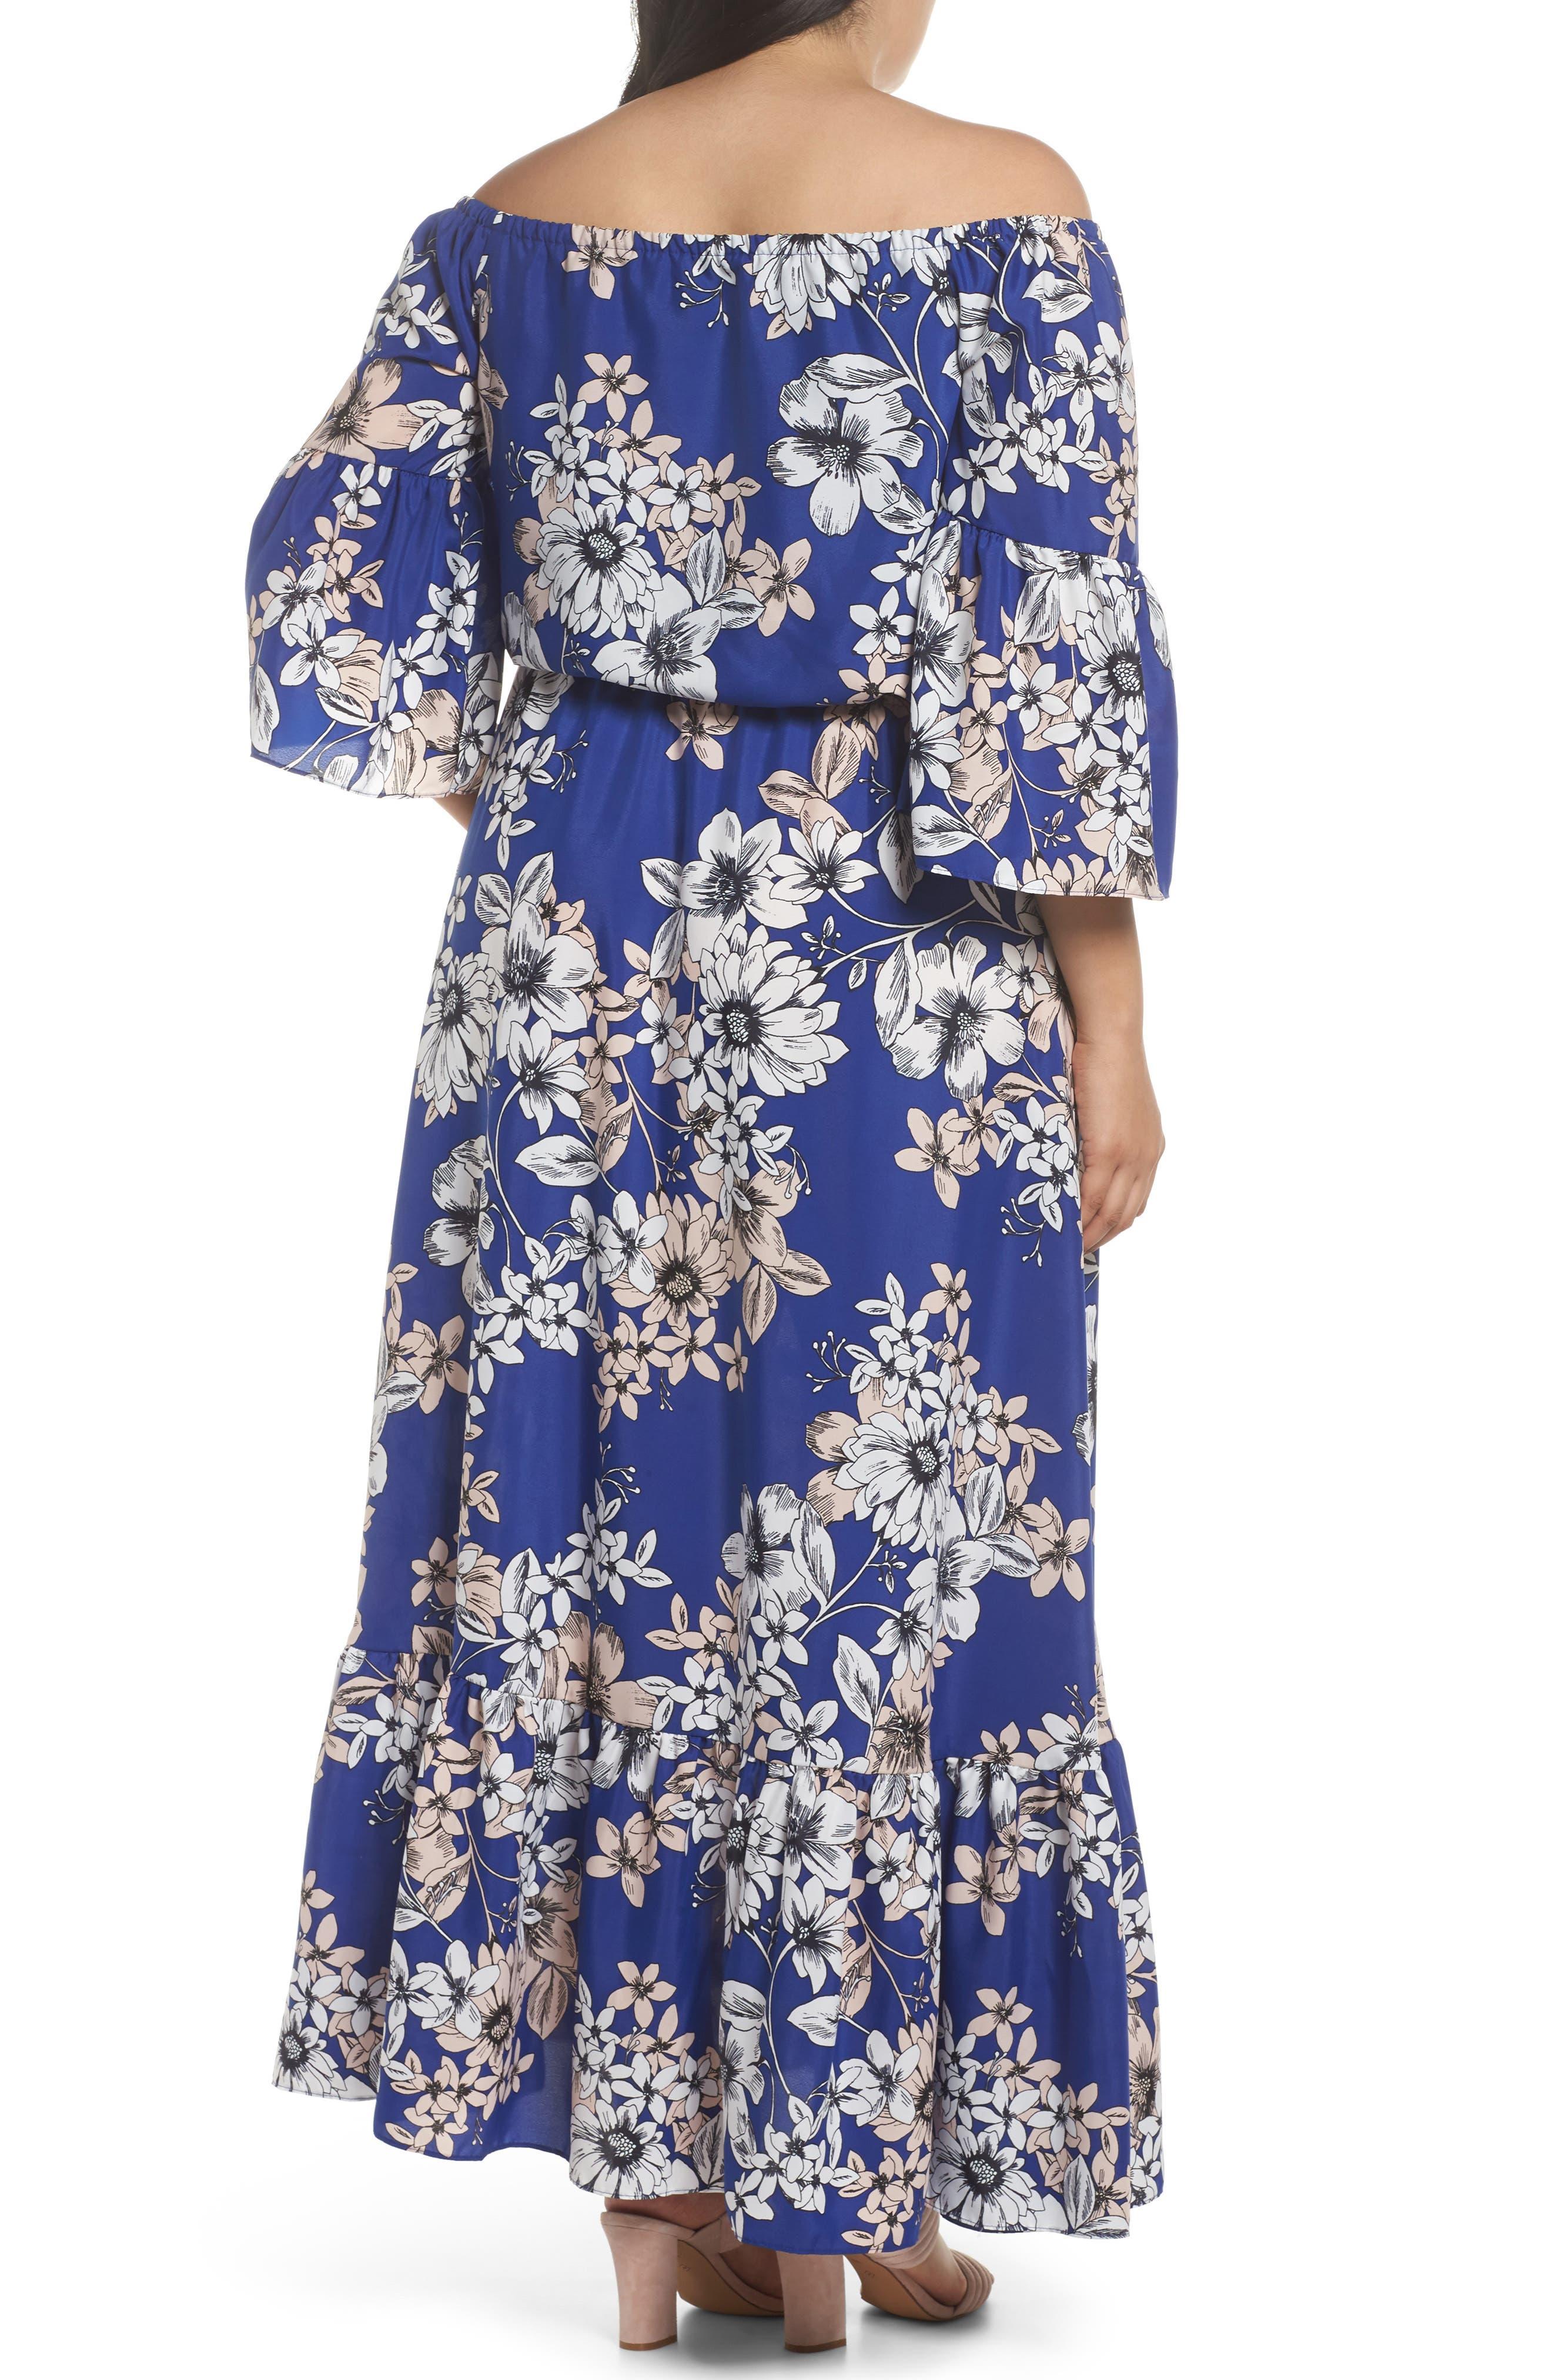 Off the Shoulder Floral Maxi Dress,                             Alternate thumbnail 2, color,                             Cobalt